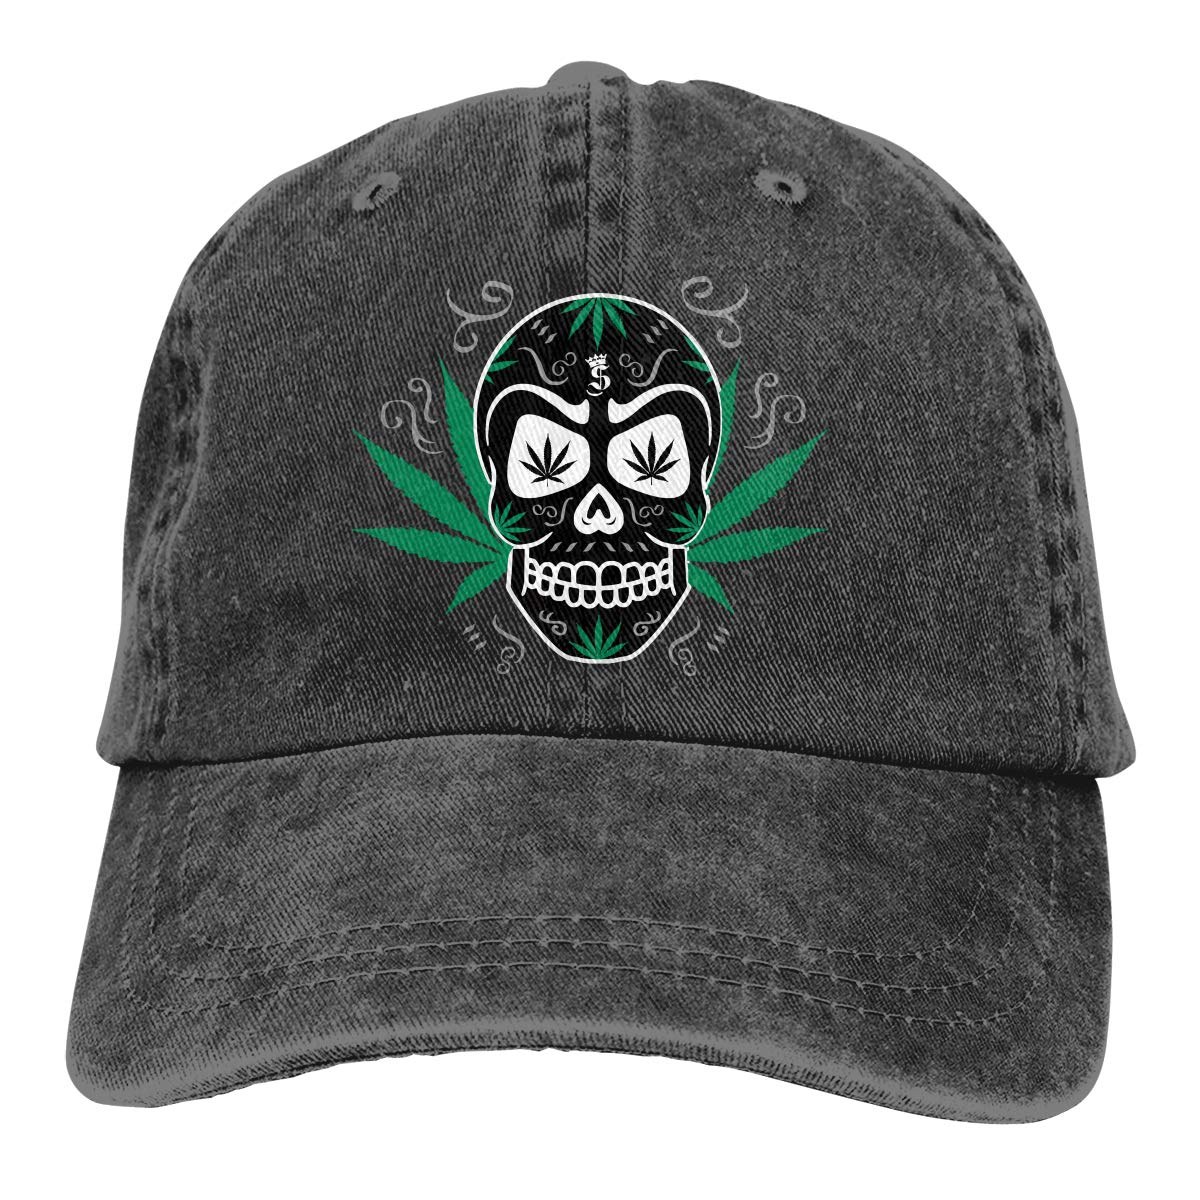 Swmo0wk2d Marijuana Skull Unisex Snapback Adult Cowboy Hat Adjustable Hats